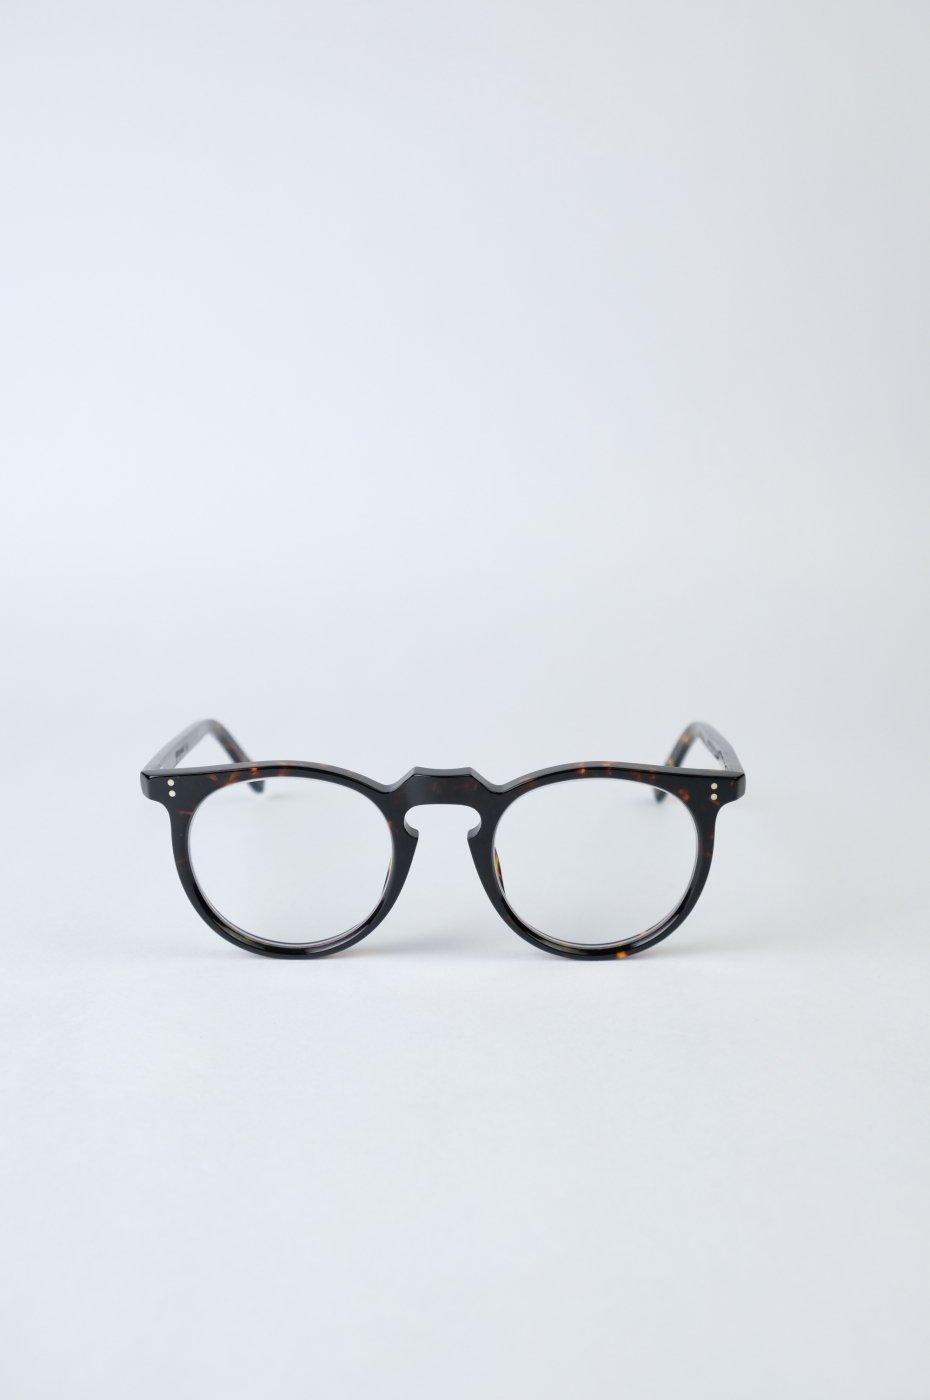 guépard ギュパール-gp-03-Écaille-Clear Lens-